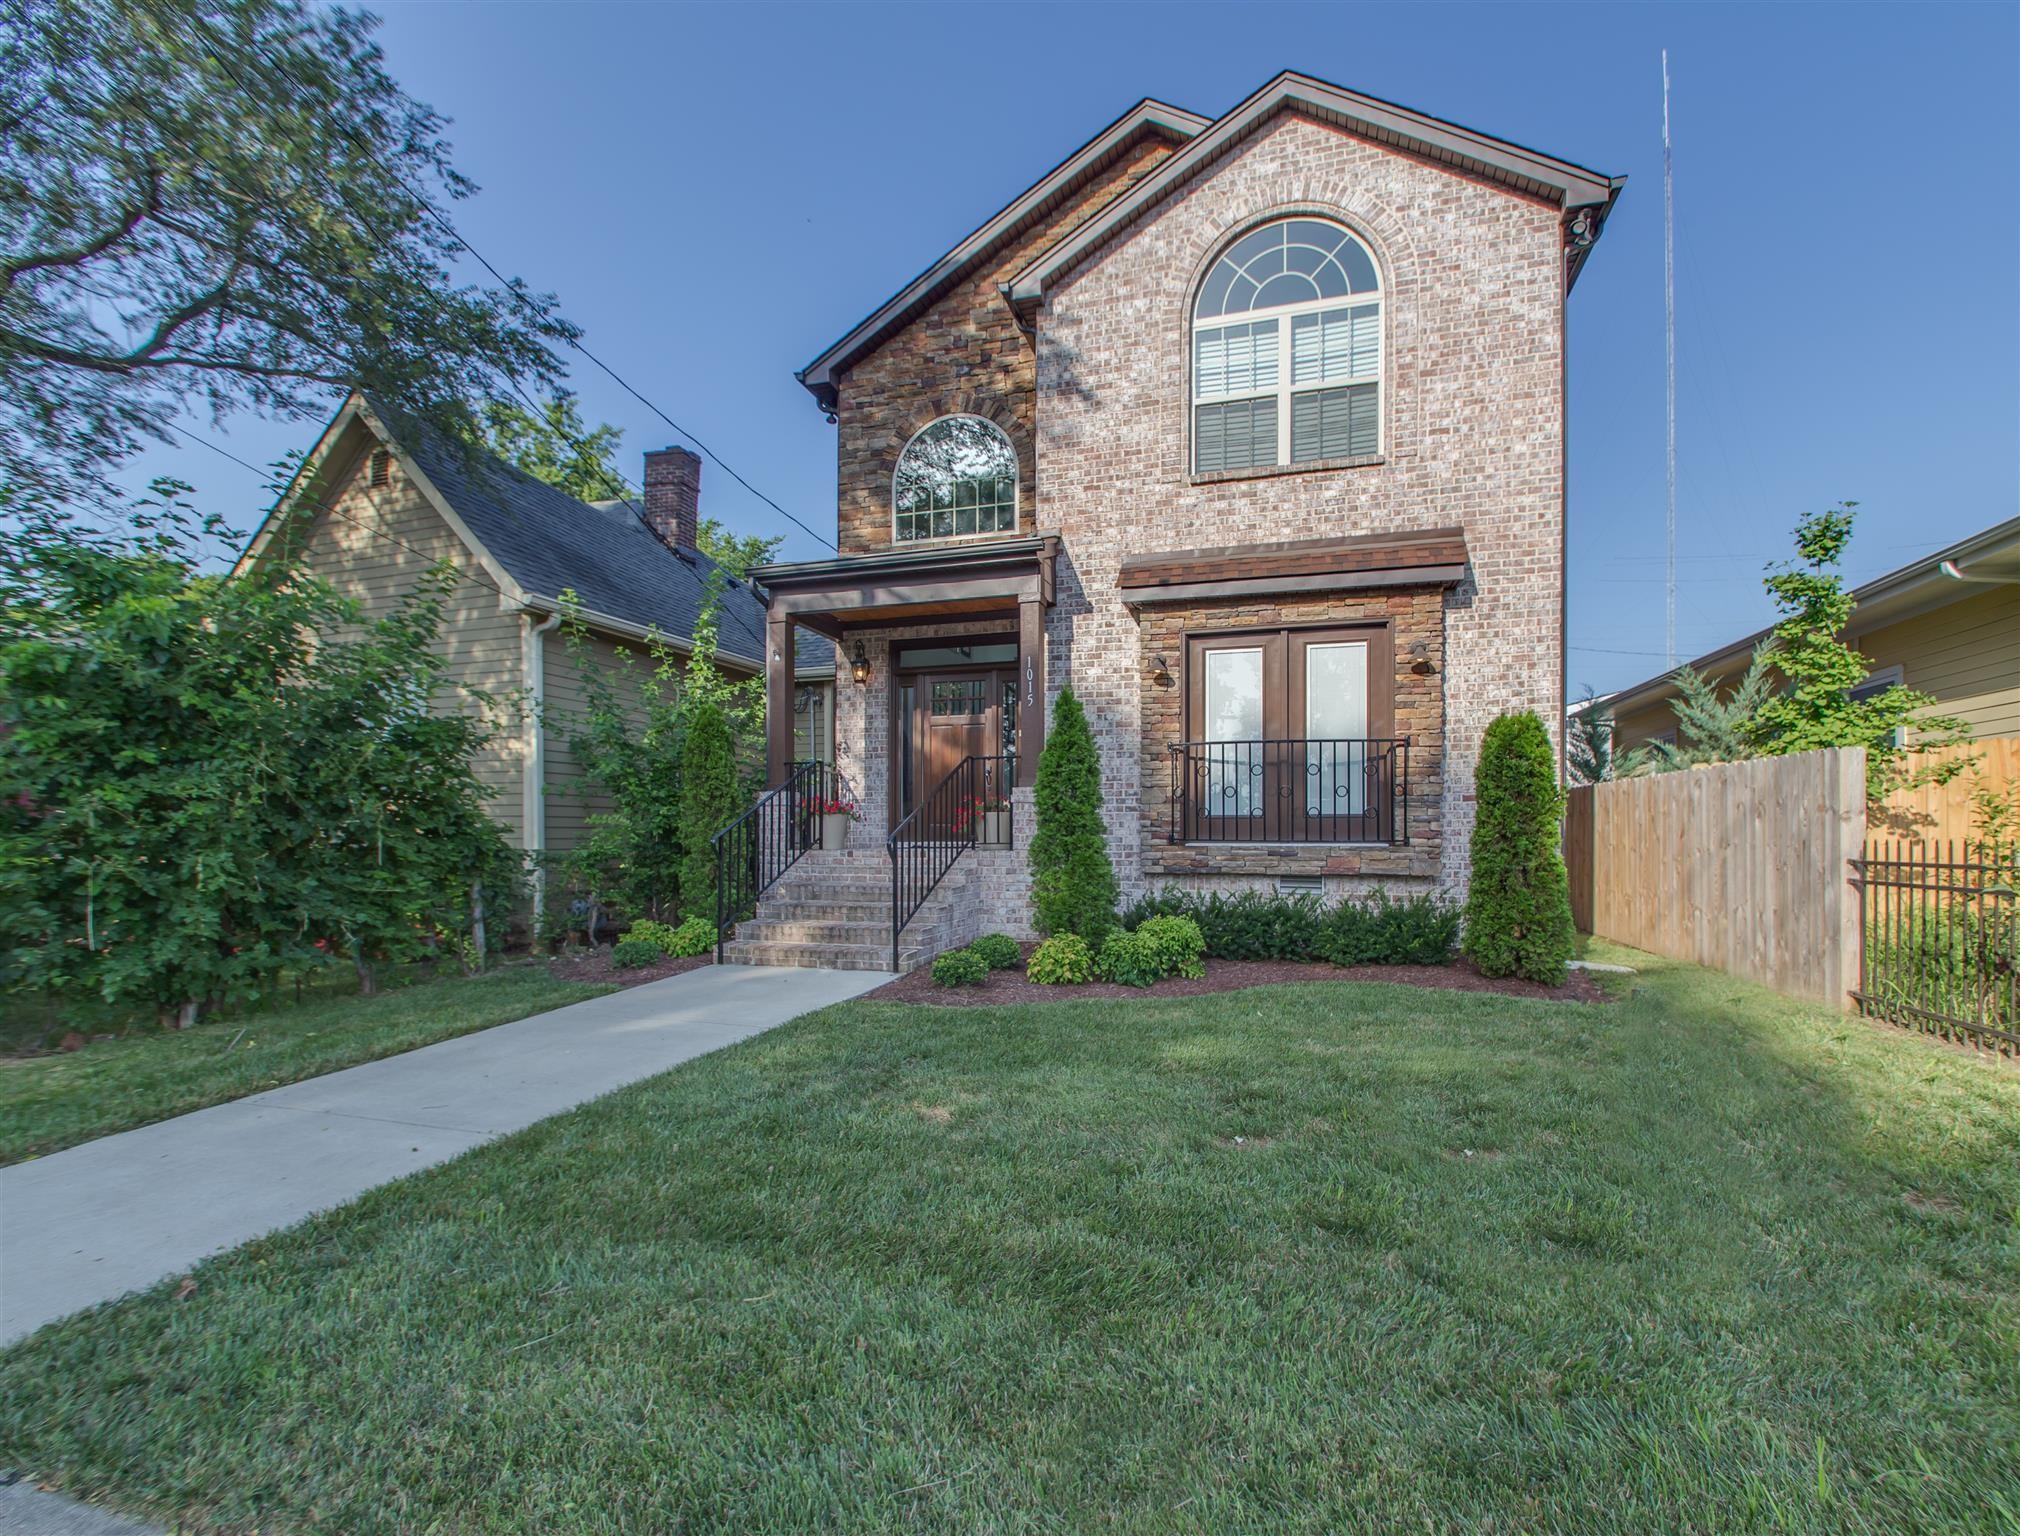 1015 2nd Ave, S, Nashville, TN 37210 - Nashville, TN real estate listing